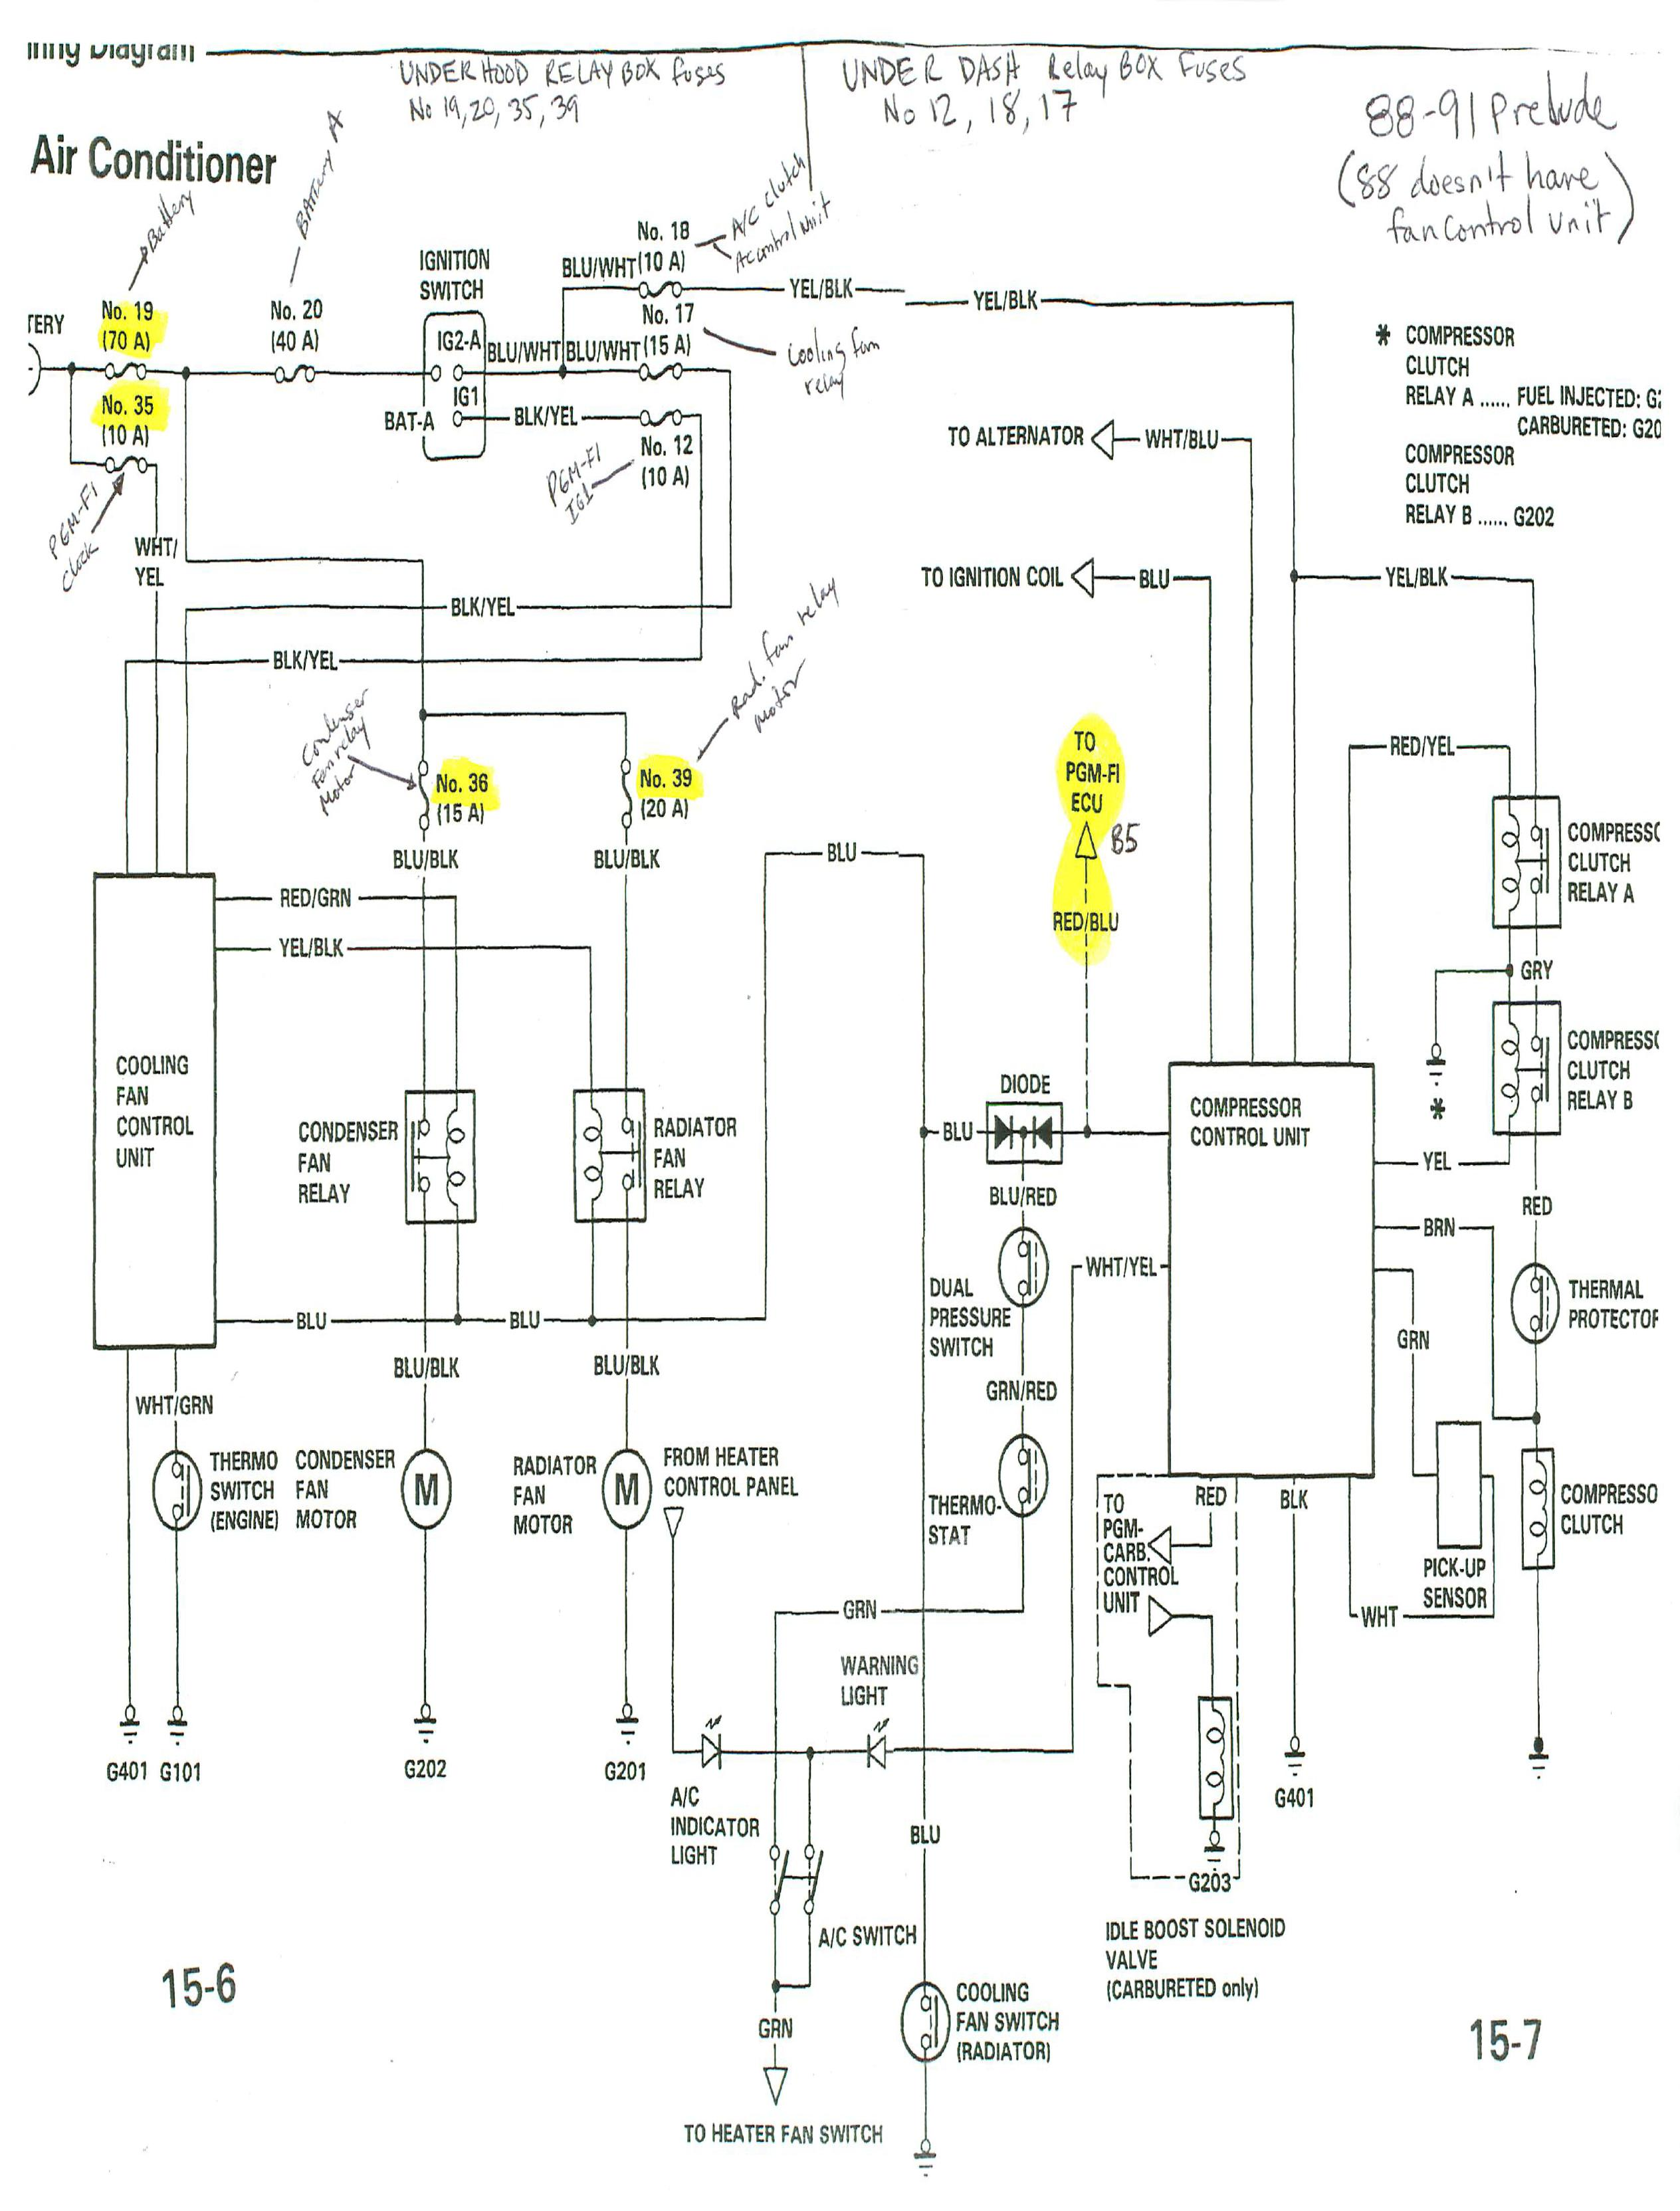 Spartan Chassis Motorhome Wiring Diagrams Search For 1998 Newmar Dutch Star Ezgo Golf Cart 2004 Diagram Dealer